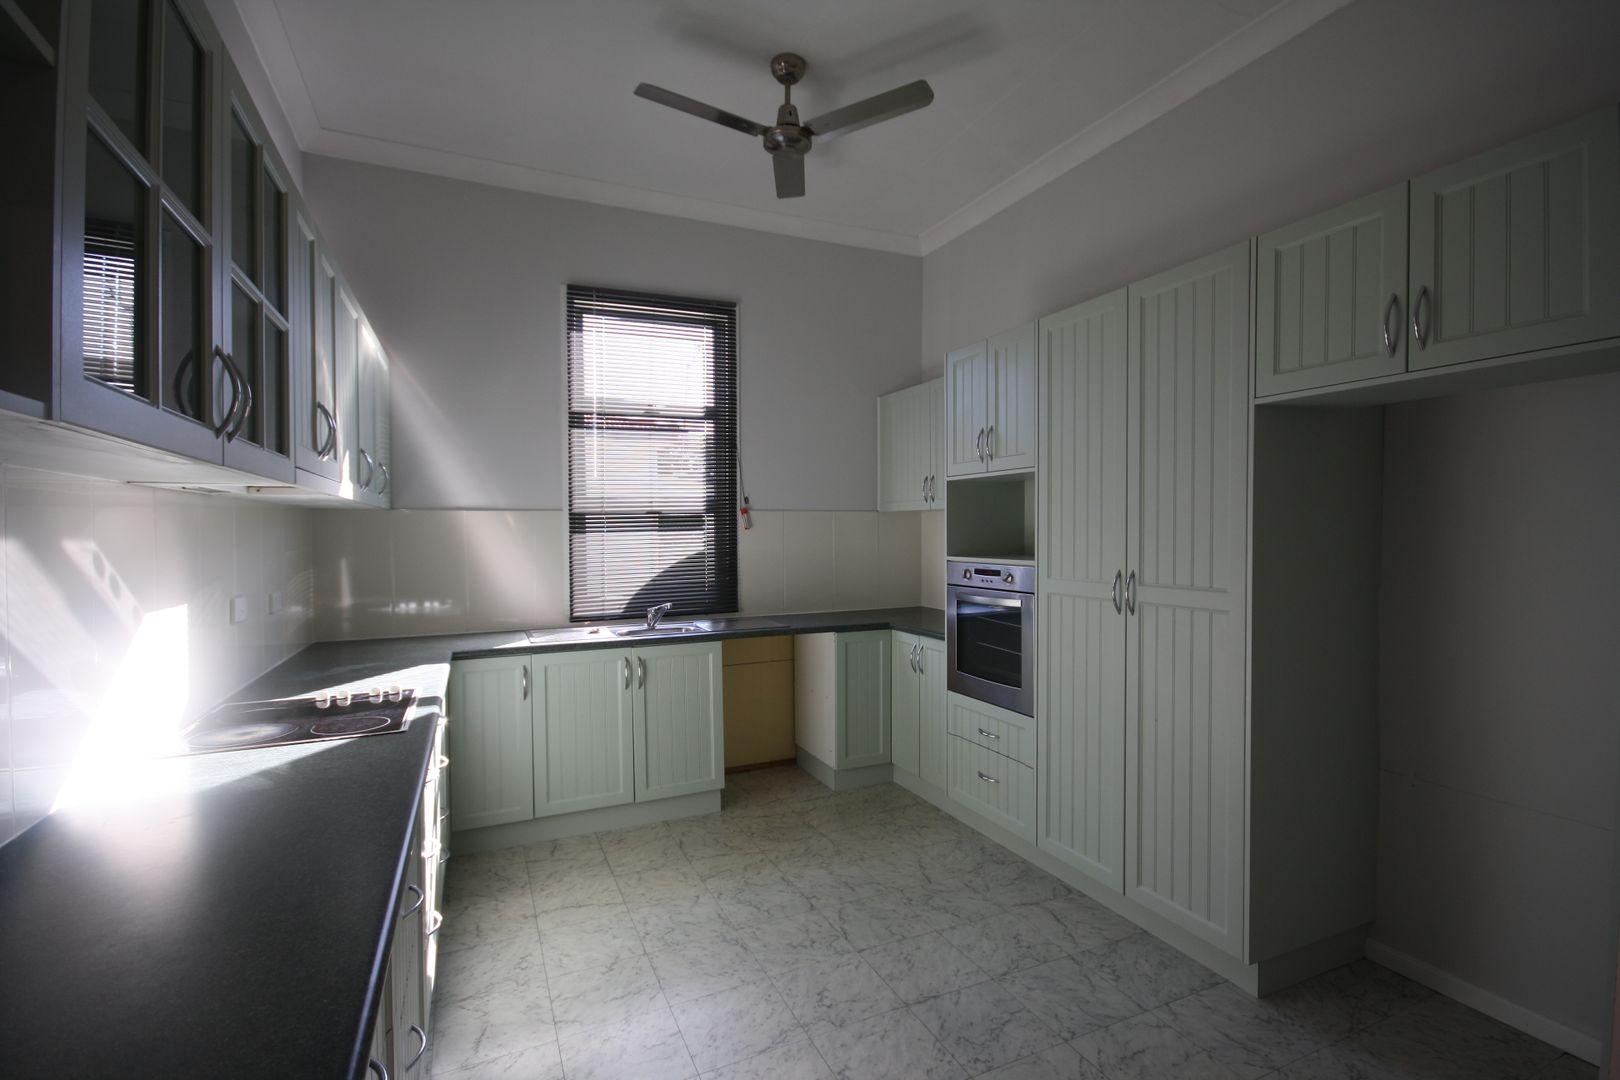 112 Percy St, Warwick QLD 4370, Image 2